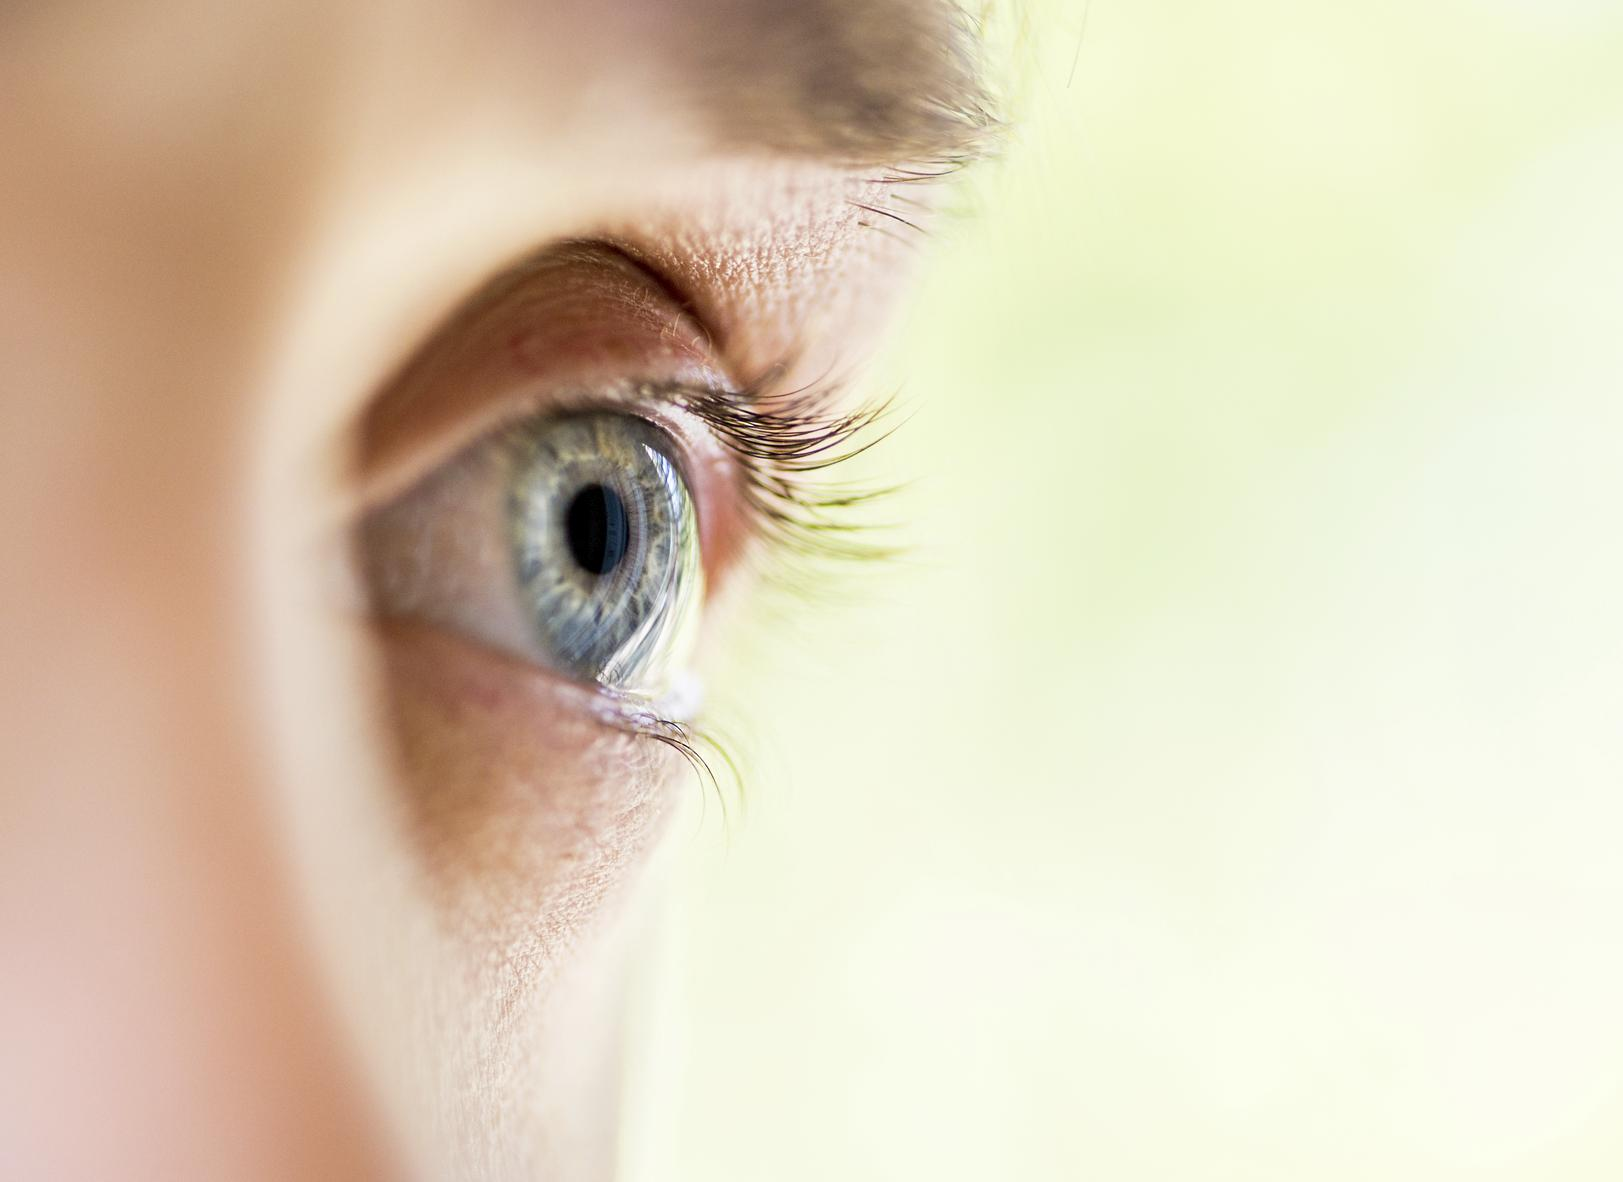 Hombre con ojos azules de perfil